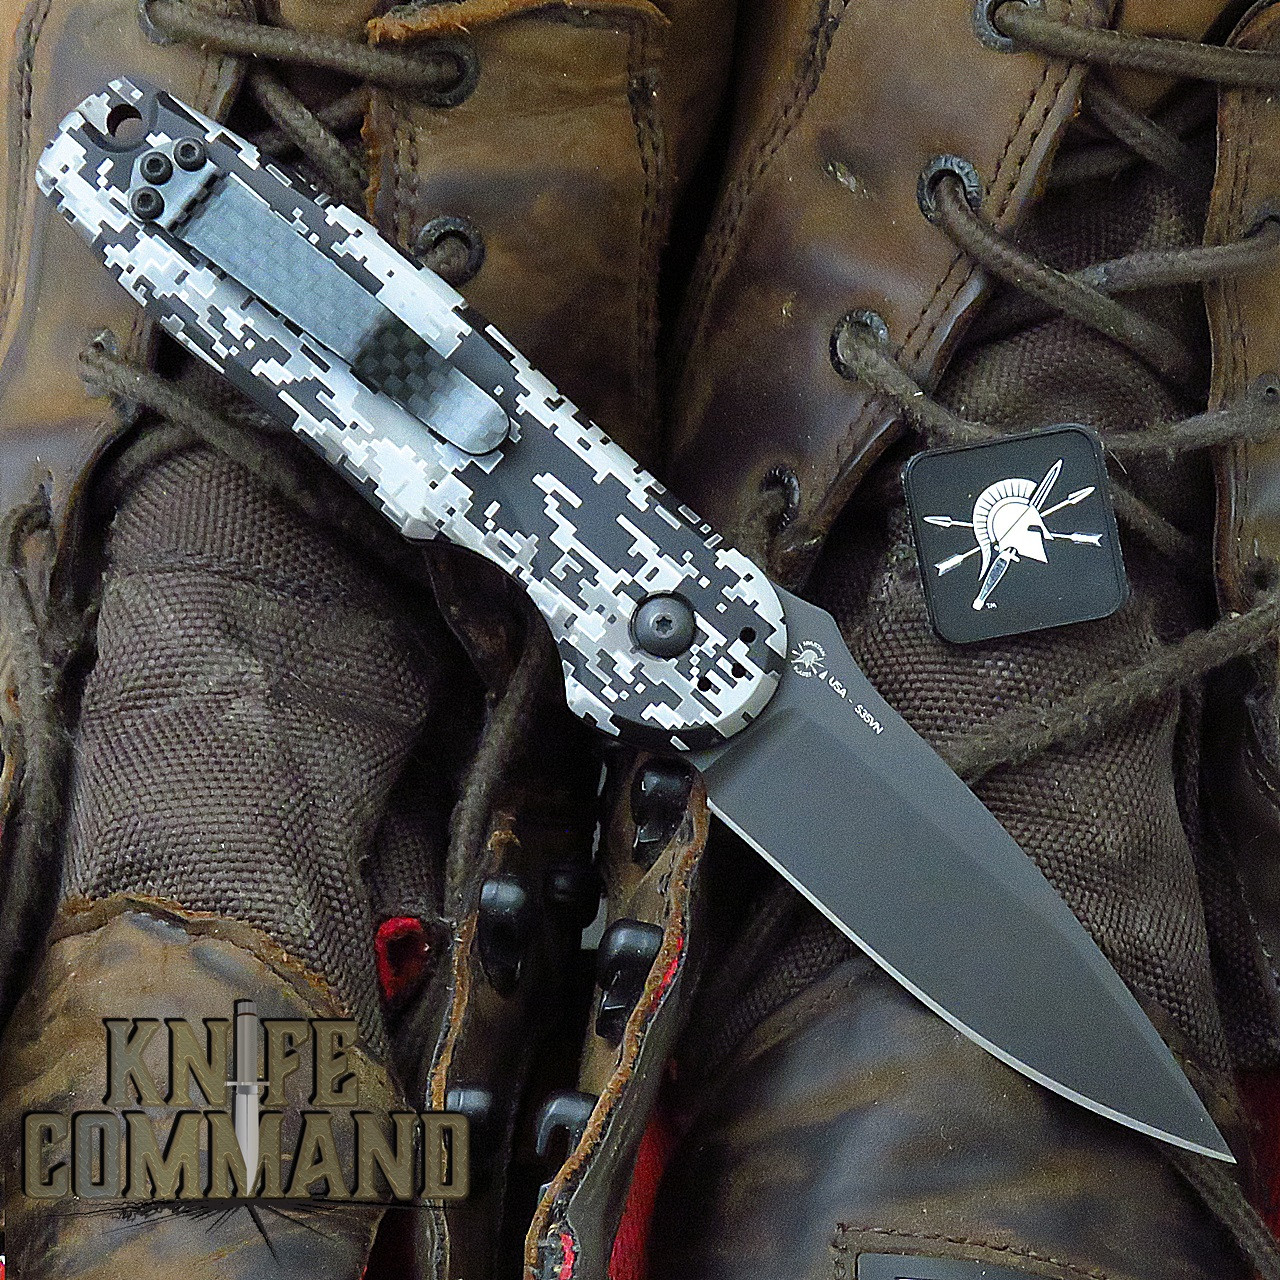 Spartan Blades Zelos AUTOMATIC Folder Camo Handle Black CPM S35VN Blade SF9